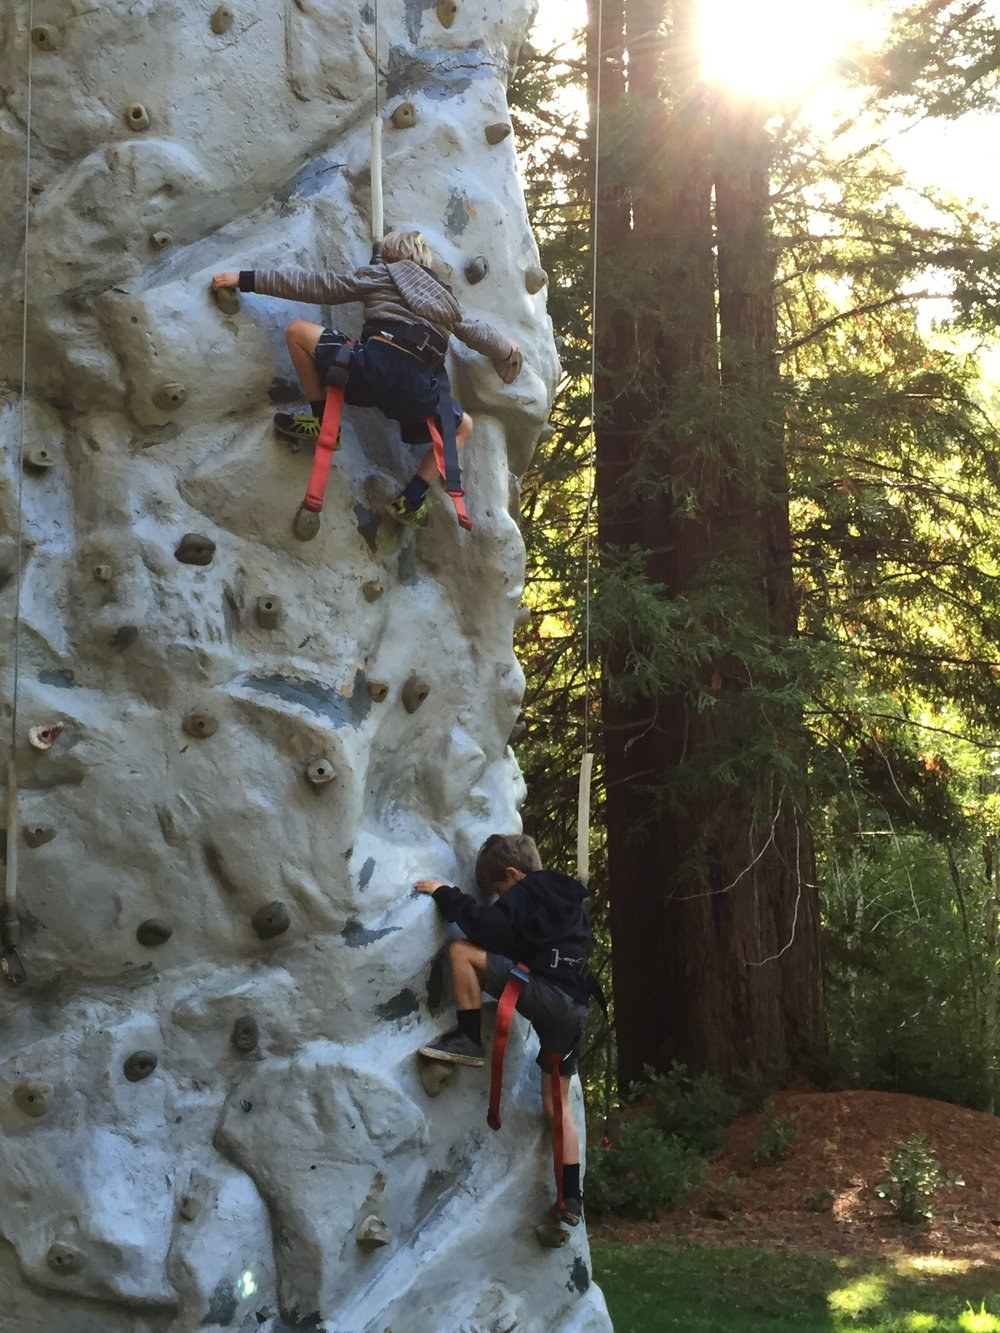 Camp Navarro_Rock Climbing_Photo credit Dan Braun.JPG